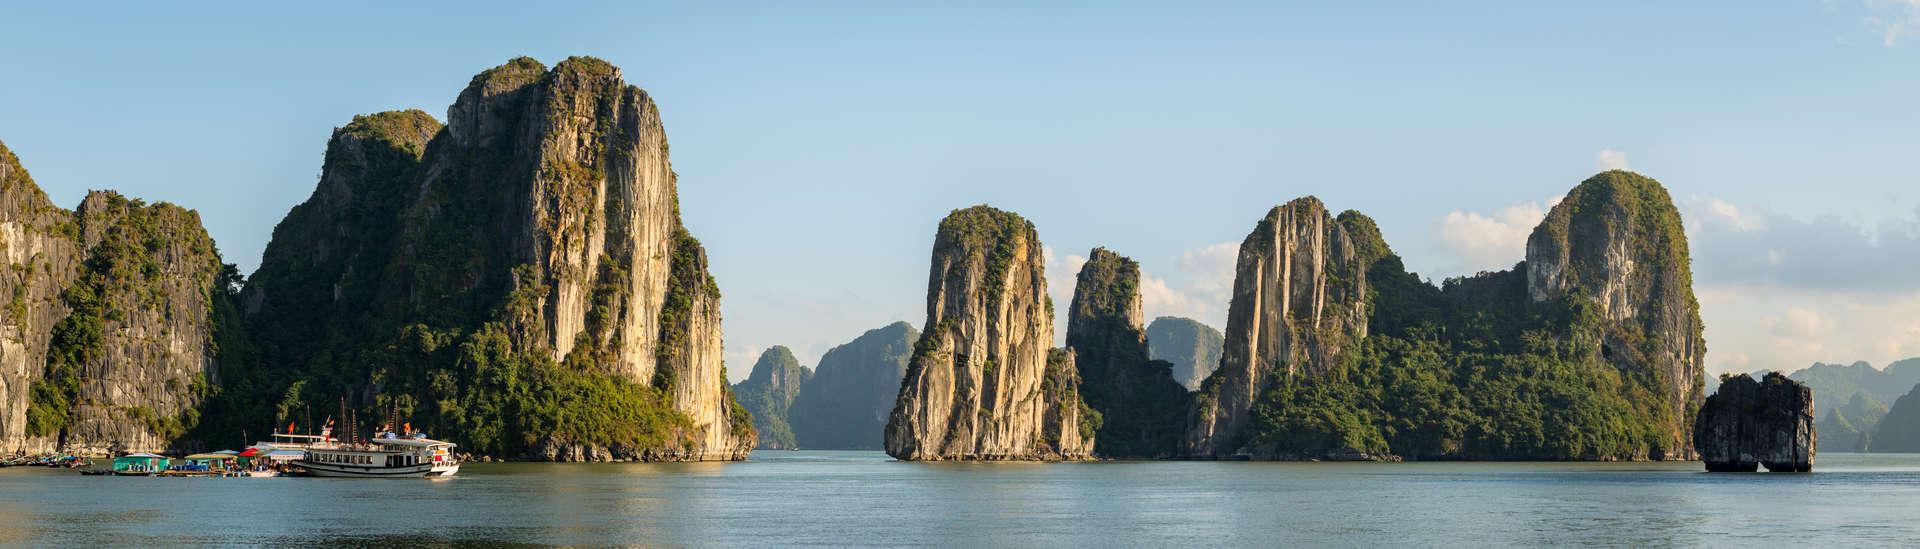 Vietnam.2015-221.jpg